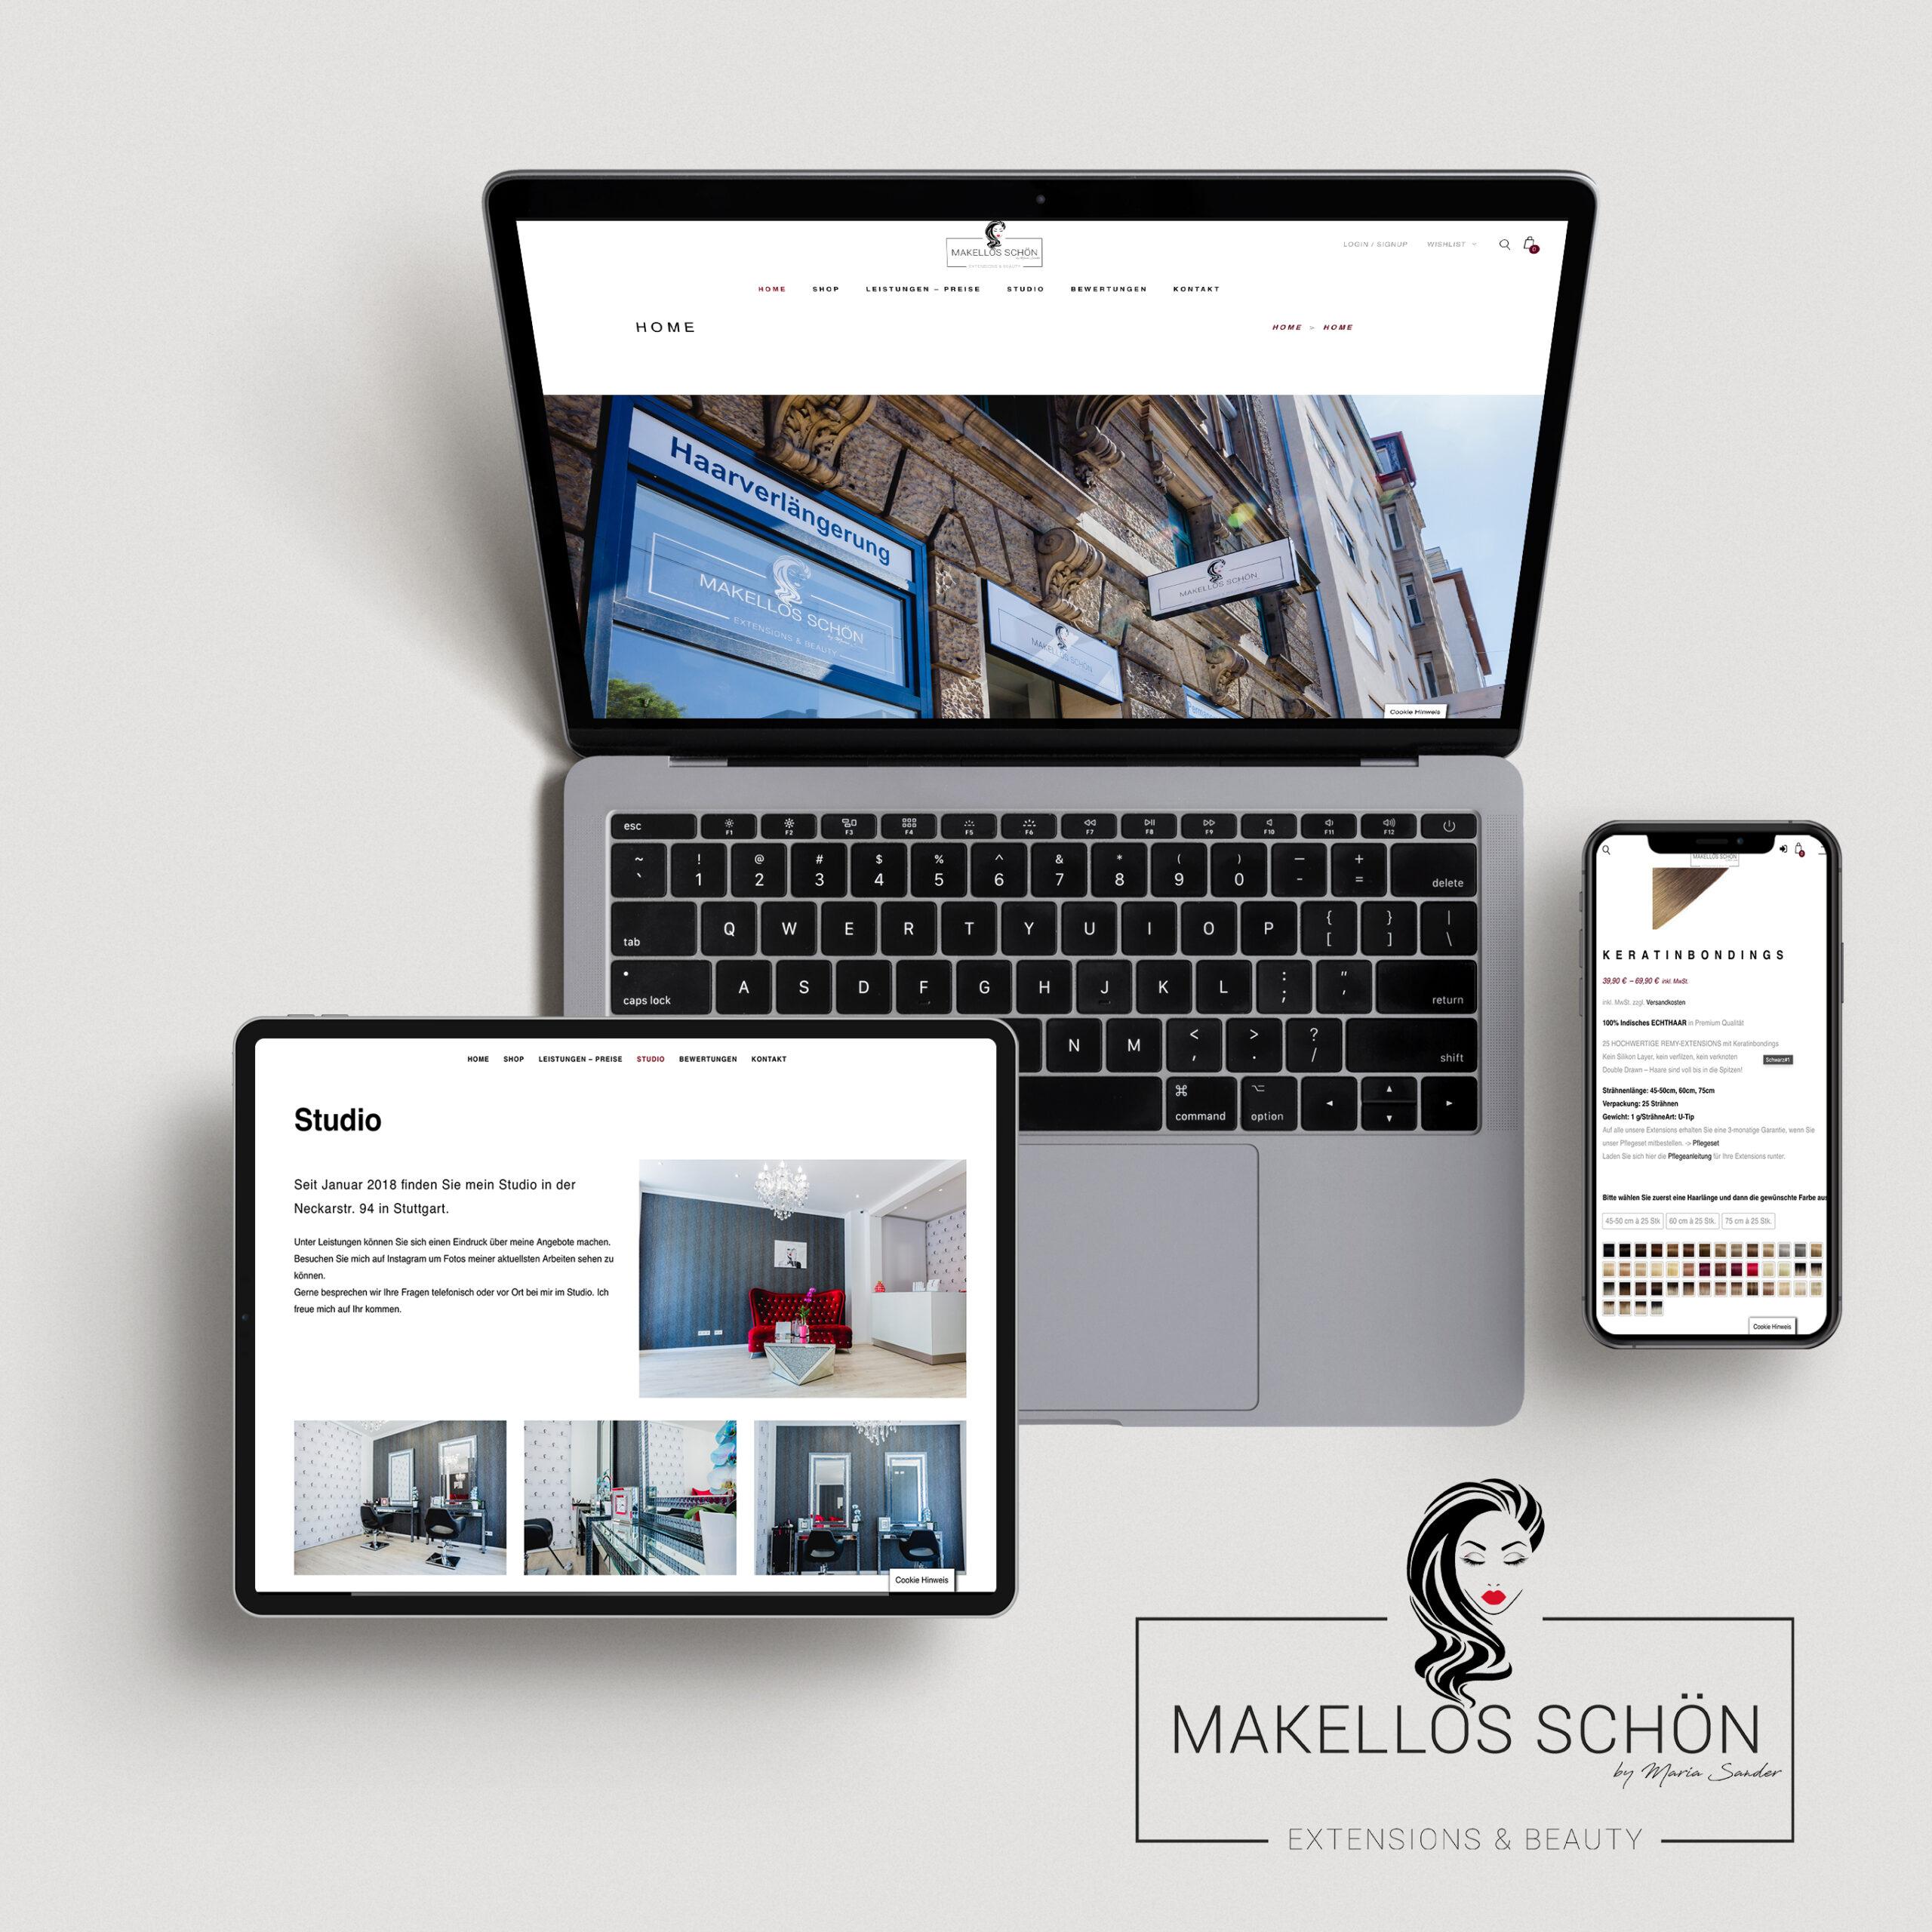 logodesign & website + onlineshop